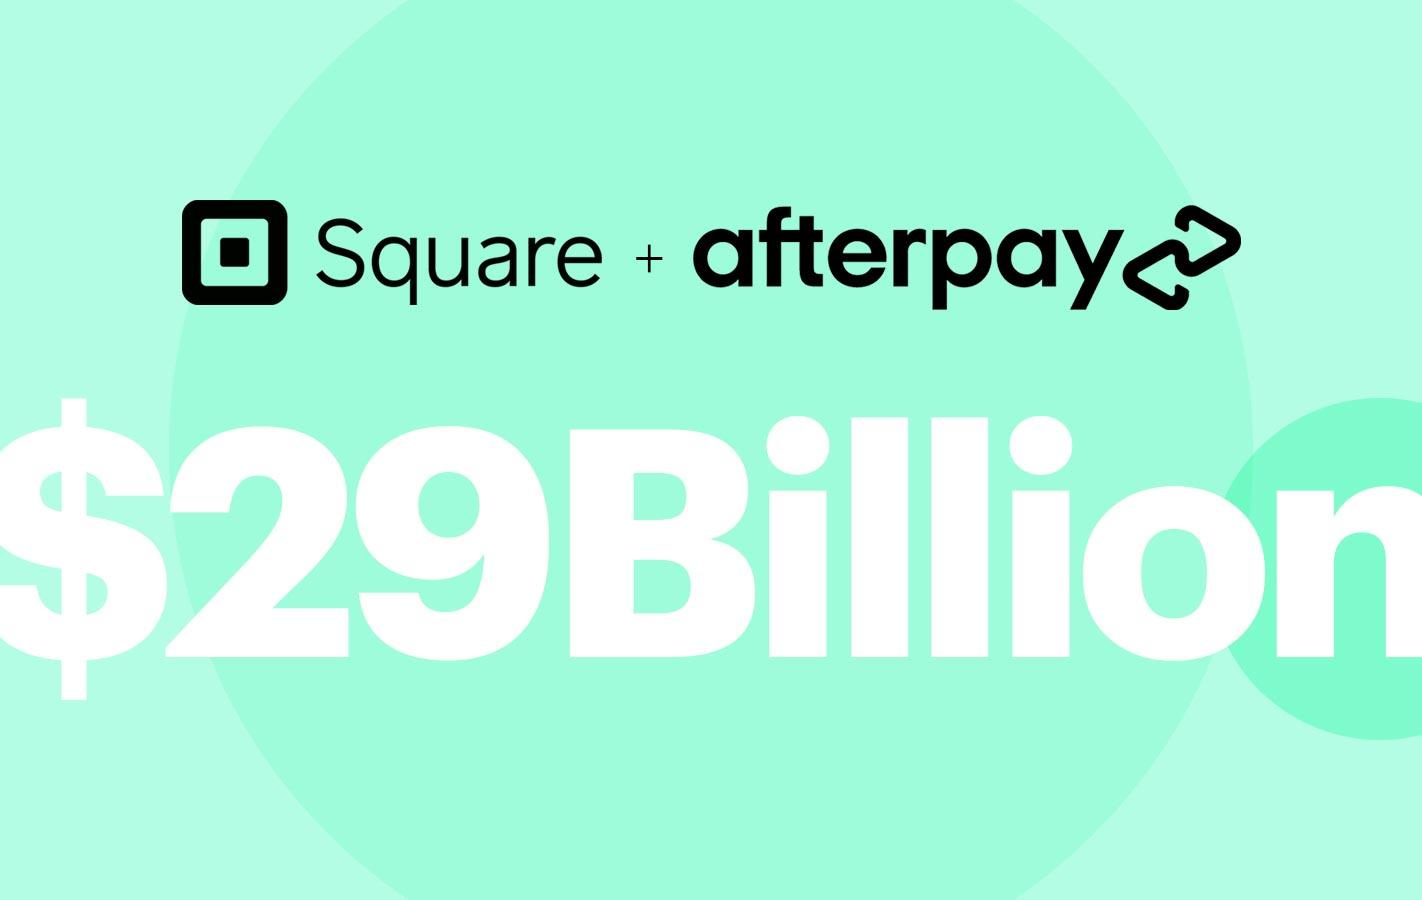 square + afterpay 29Billion